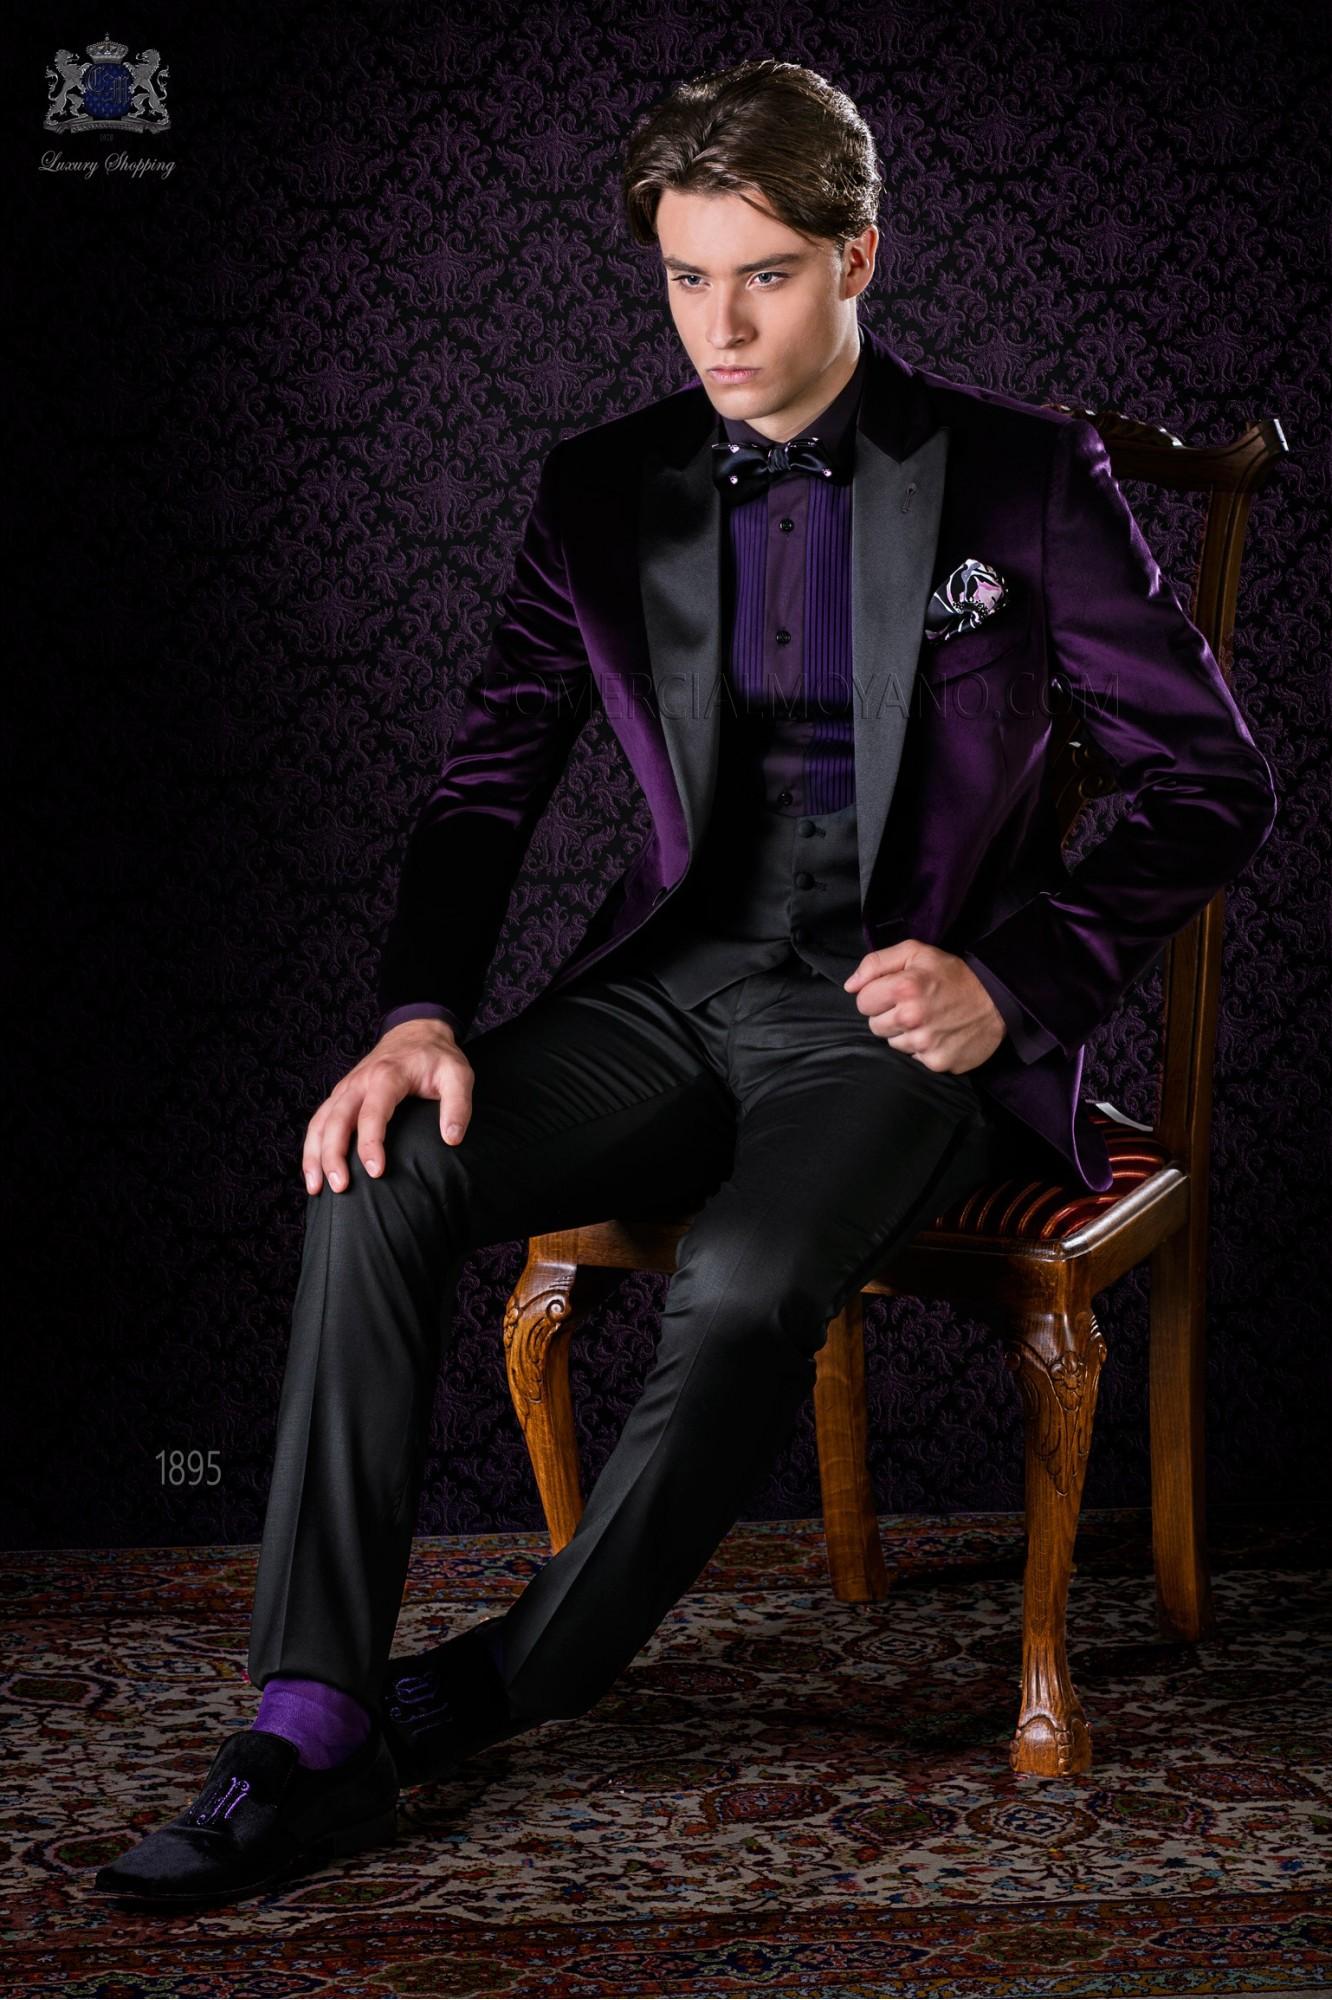 Esmoquin italiano púrpura de terciopelo combinado con pantalón negro modelo: 1895 Ottavio Nuccio Gala colección Black Tie 2017